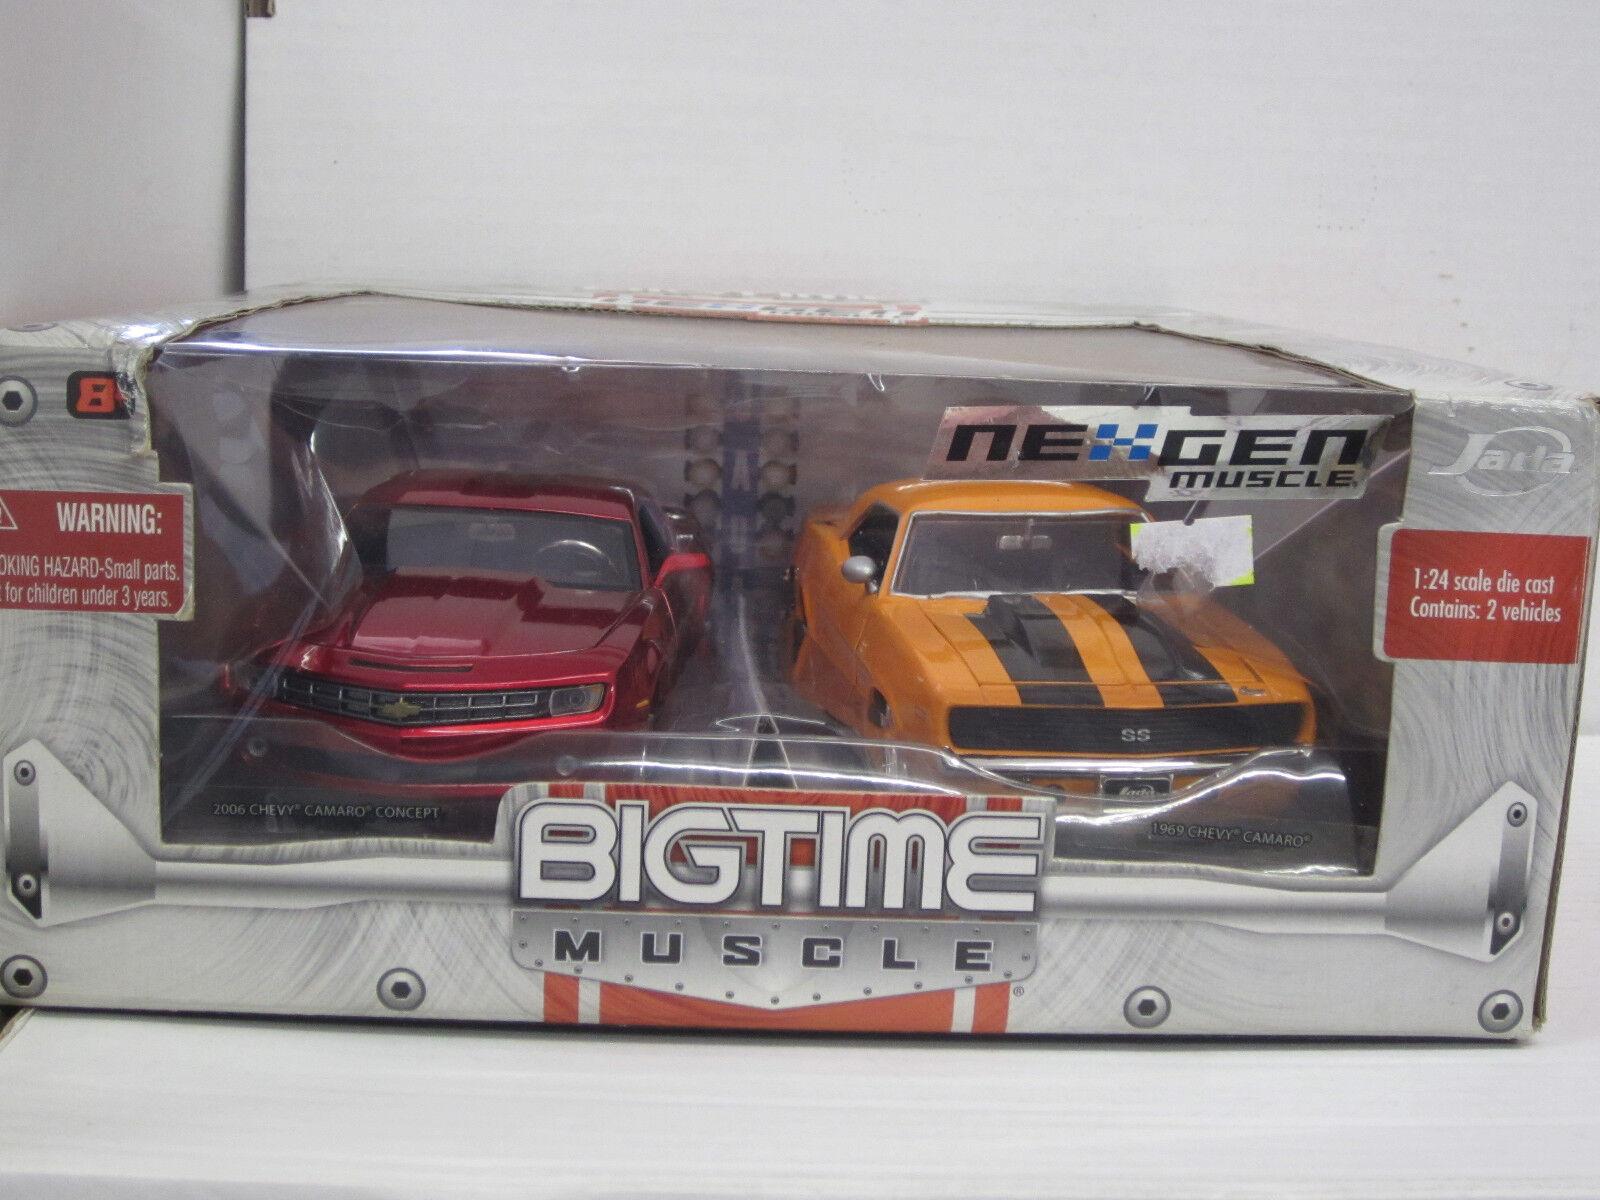 2x Chevrolet Chevy Camaro, 1969 et 2006, Jada Big Time NexGen Muscle, neuf dans sa boîte, 1 24